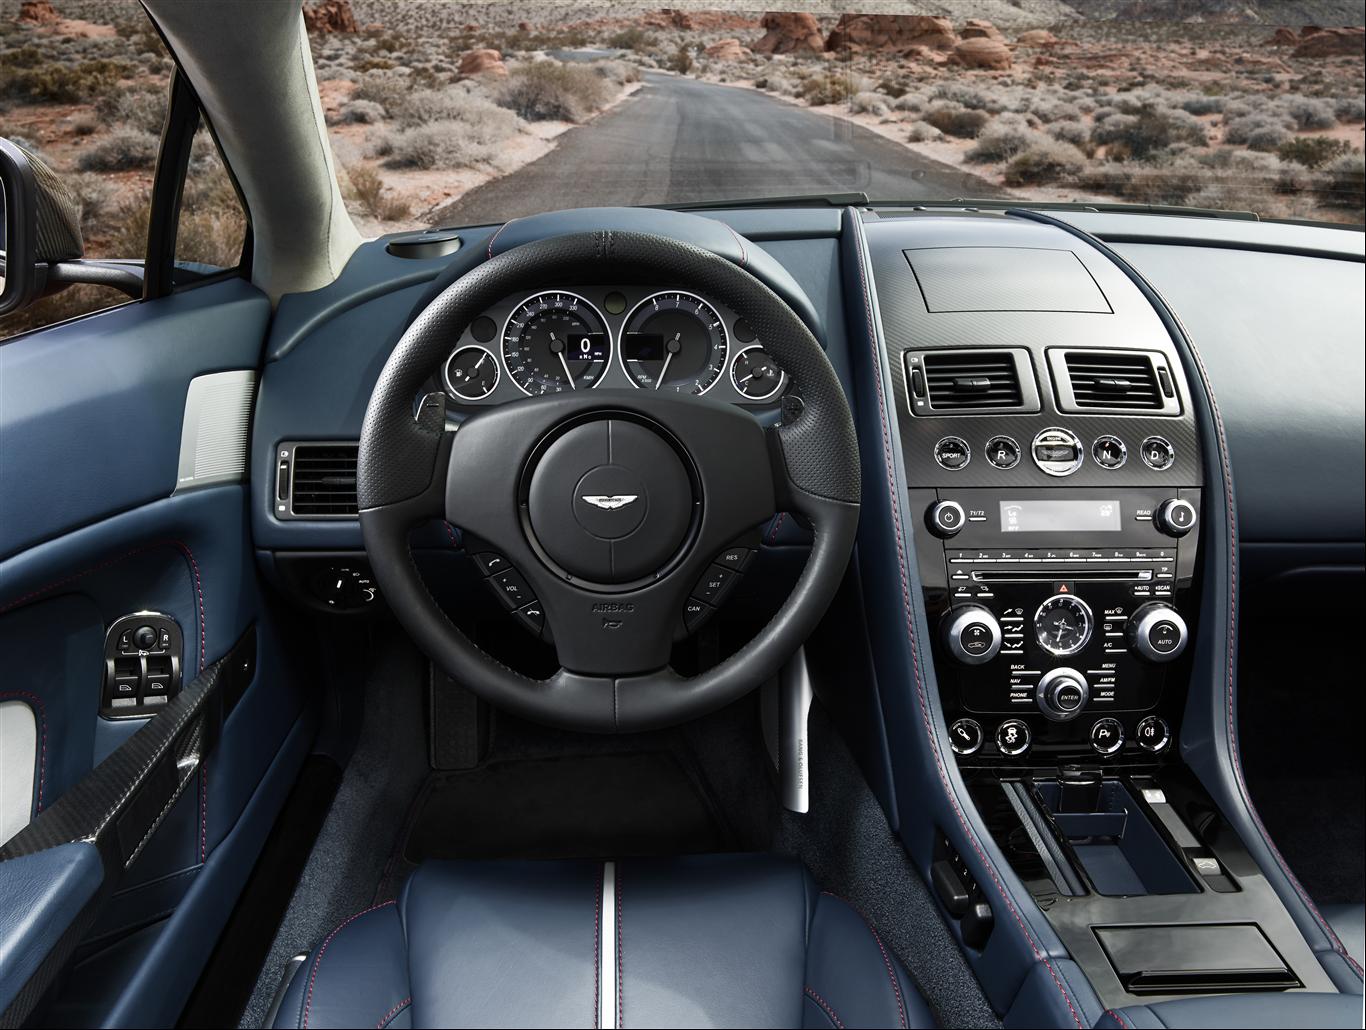 Aston Martin V12 Vantage S Roadster 2015 - 2